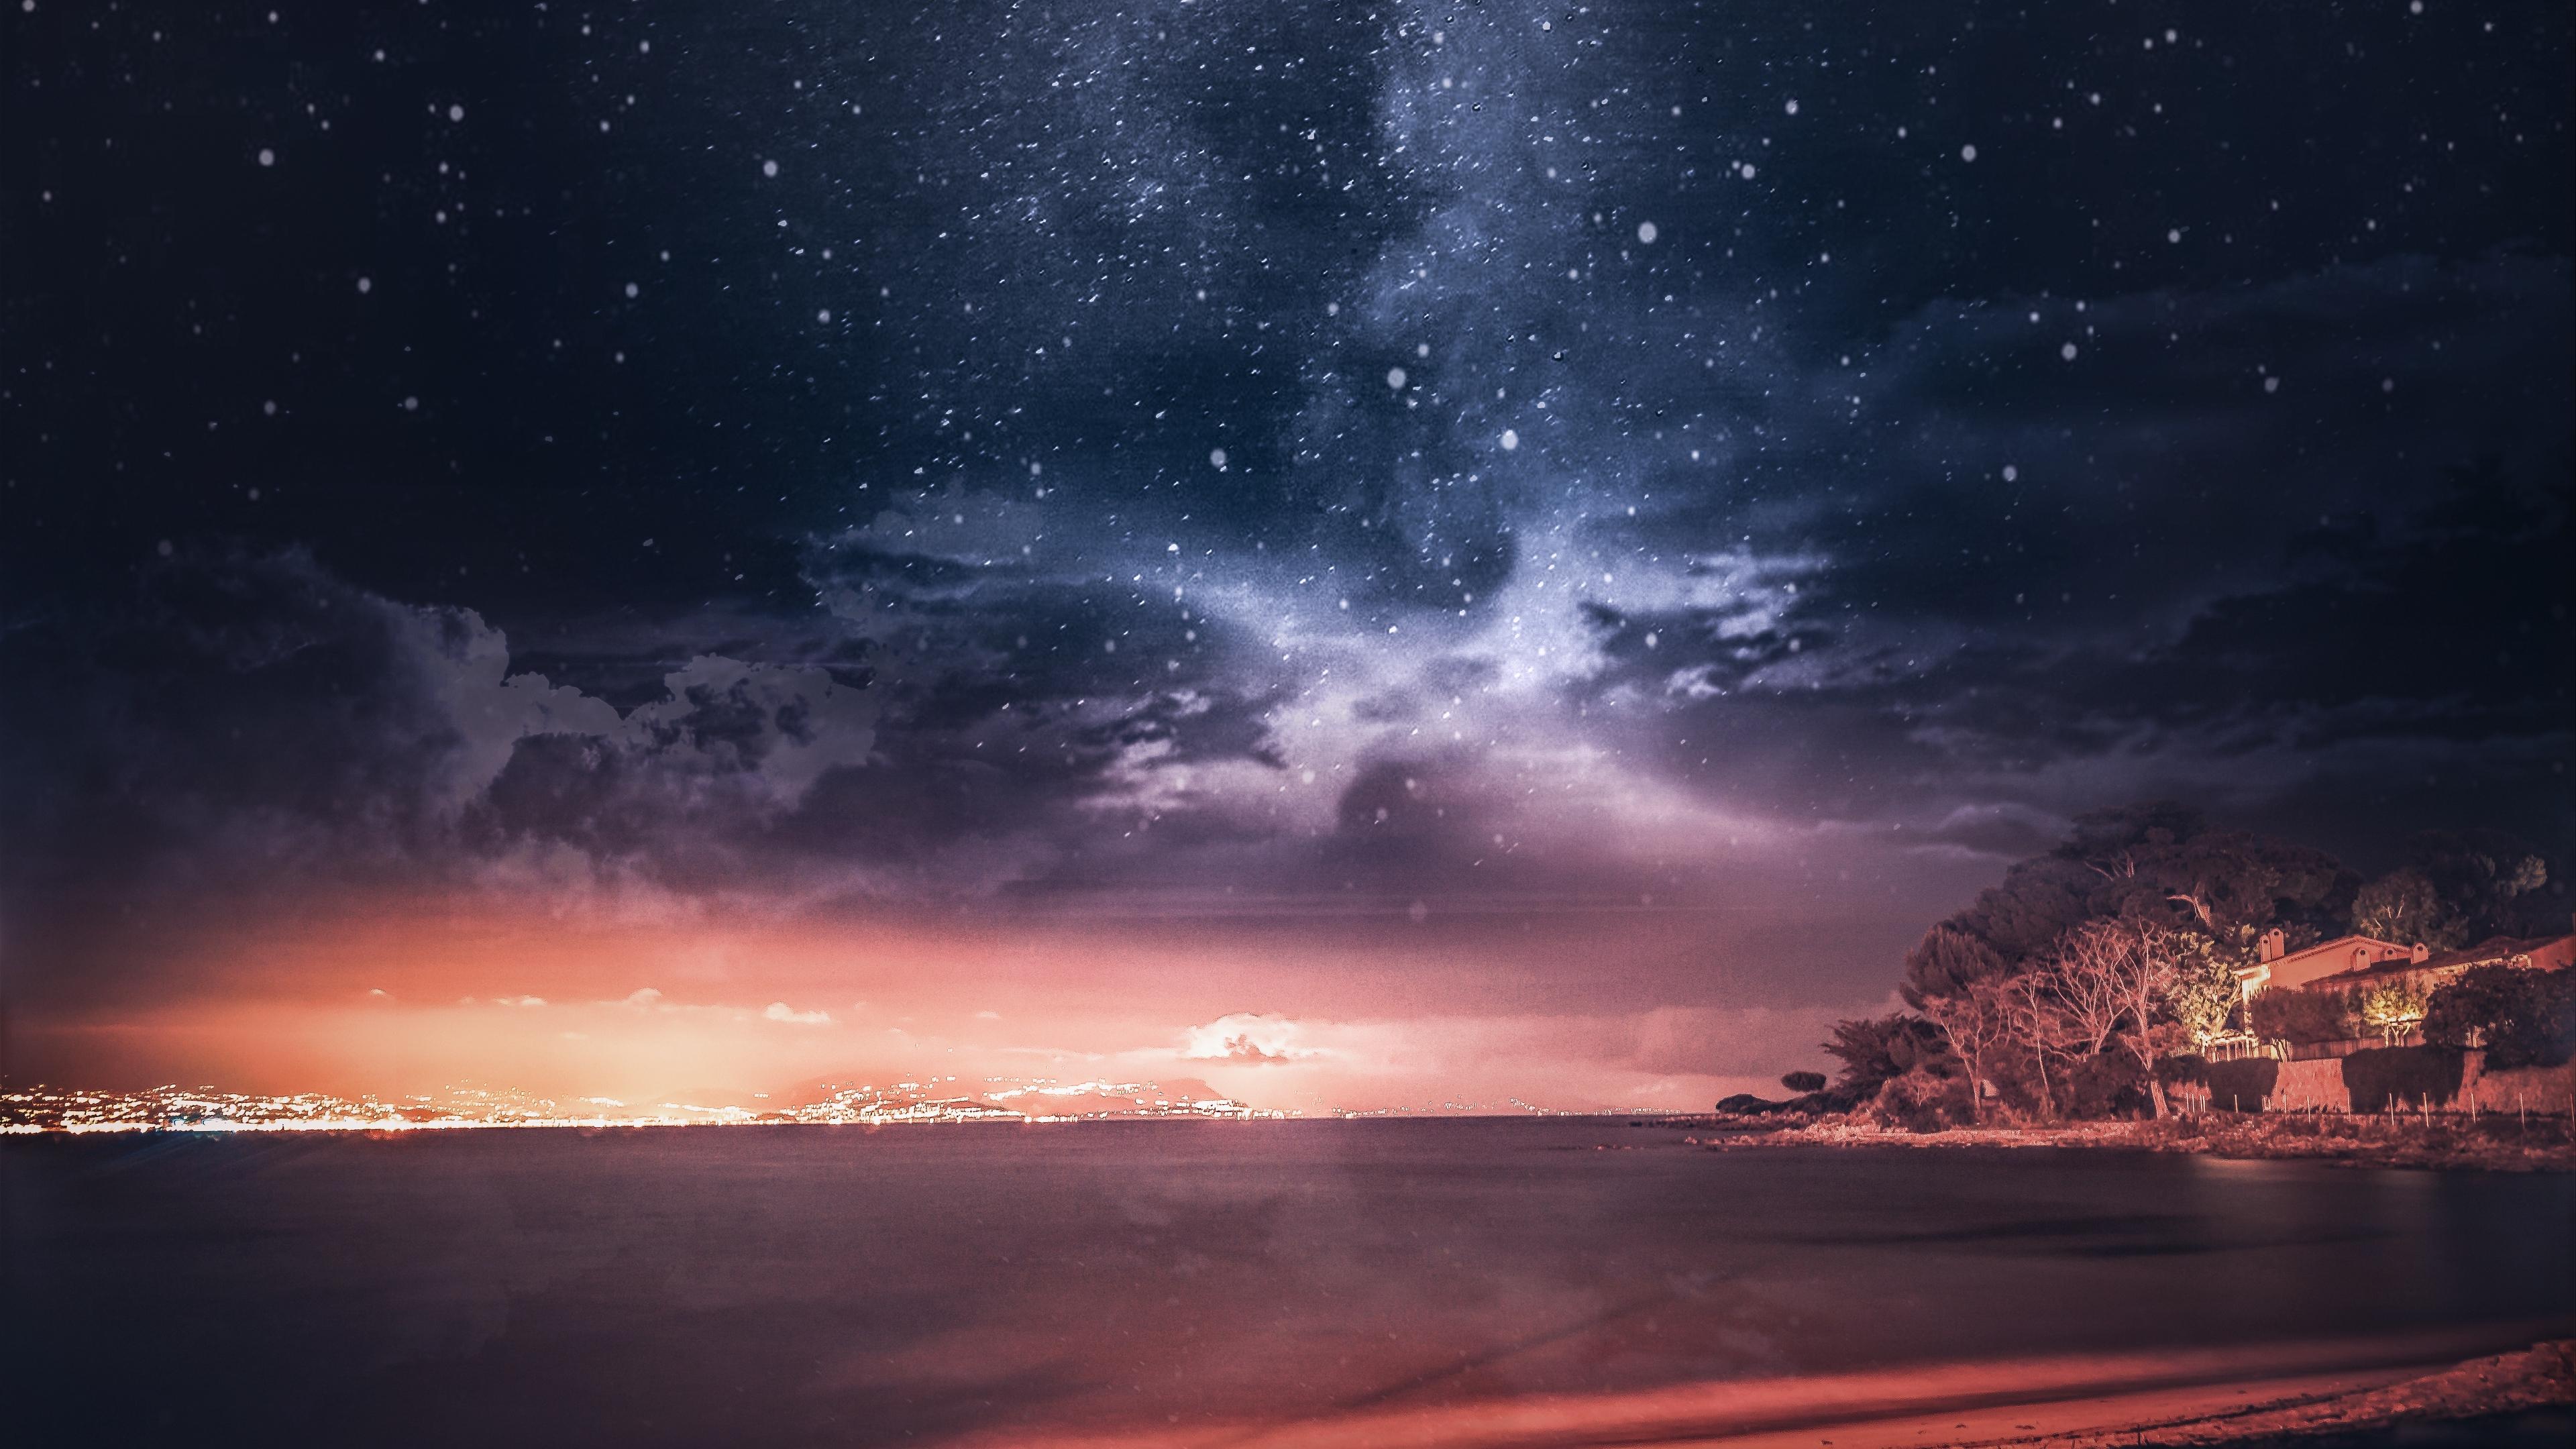 sea sunset starry sky horizon france 4k 1541117450 - sea, sunset, starry sky, horizon, france 4k - sunset, starry sky, Sea